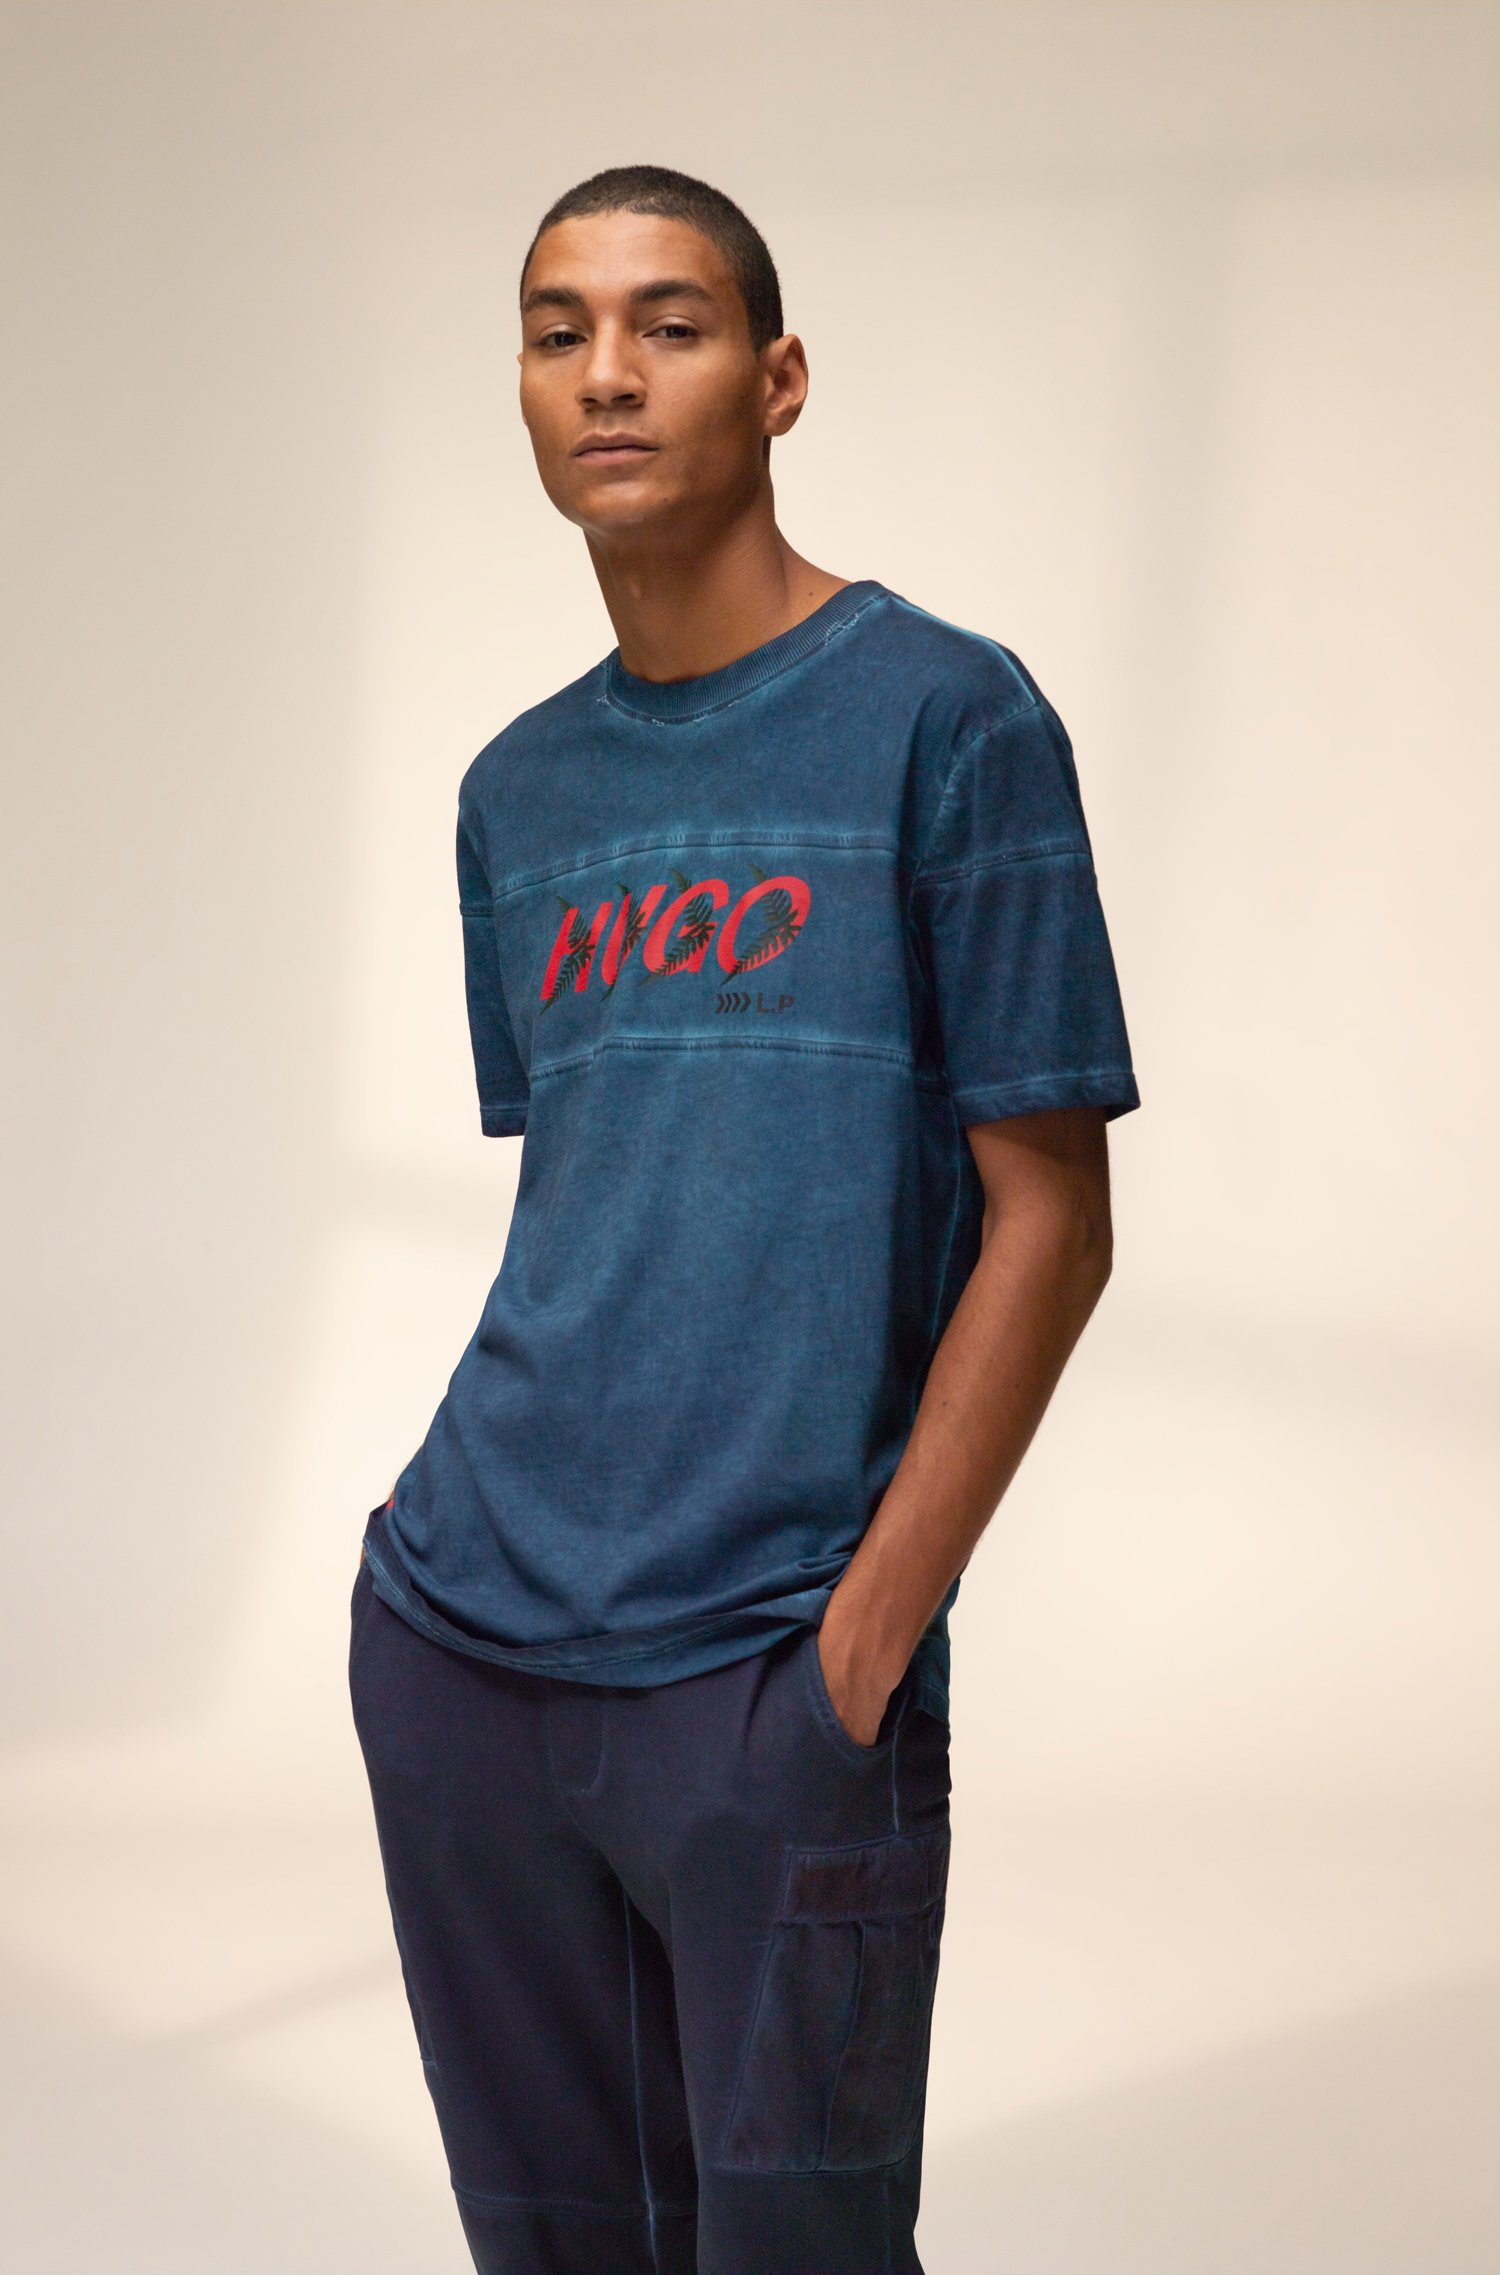 Unisex T-shirt in cotton with forest-inspired logo motif, Dark Blue